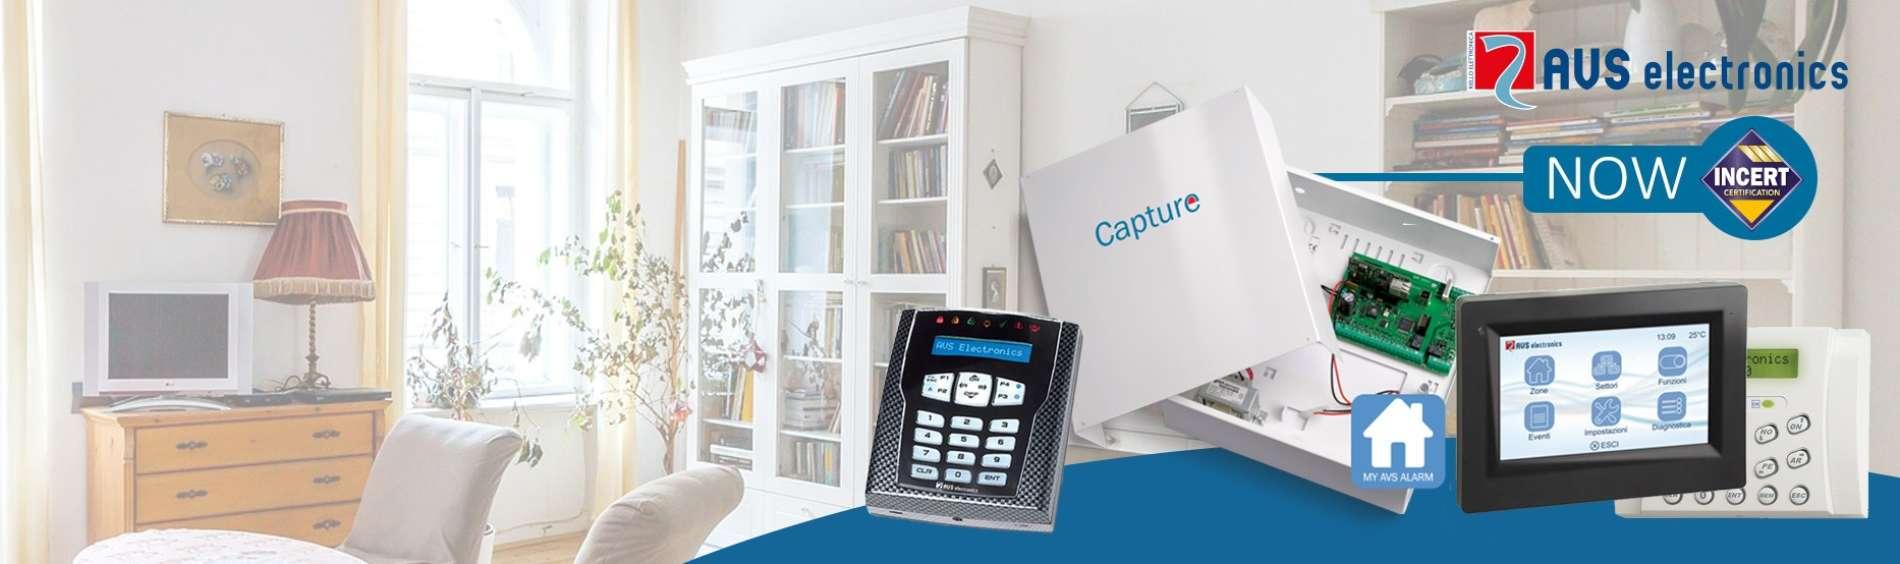 CAPTURE - AVS Electronics